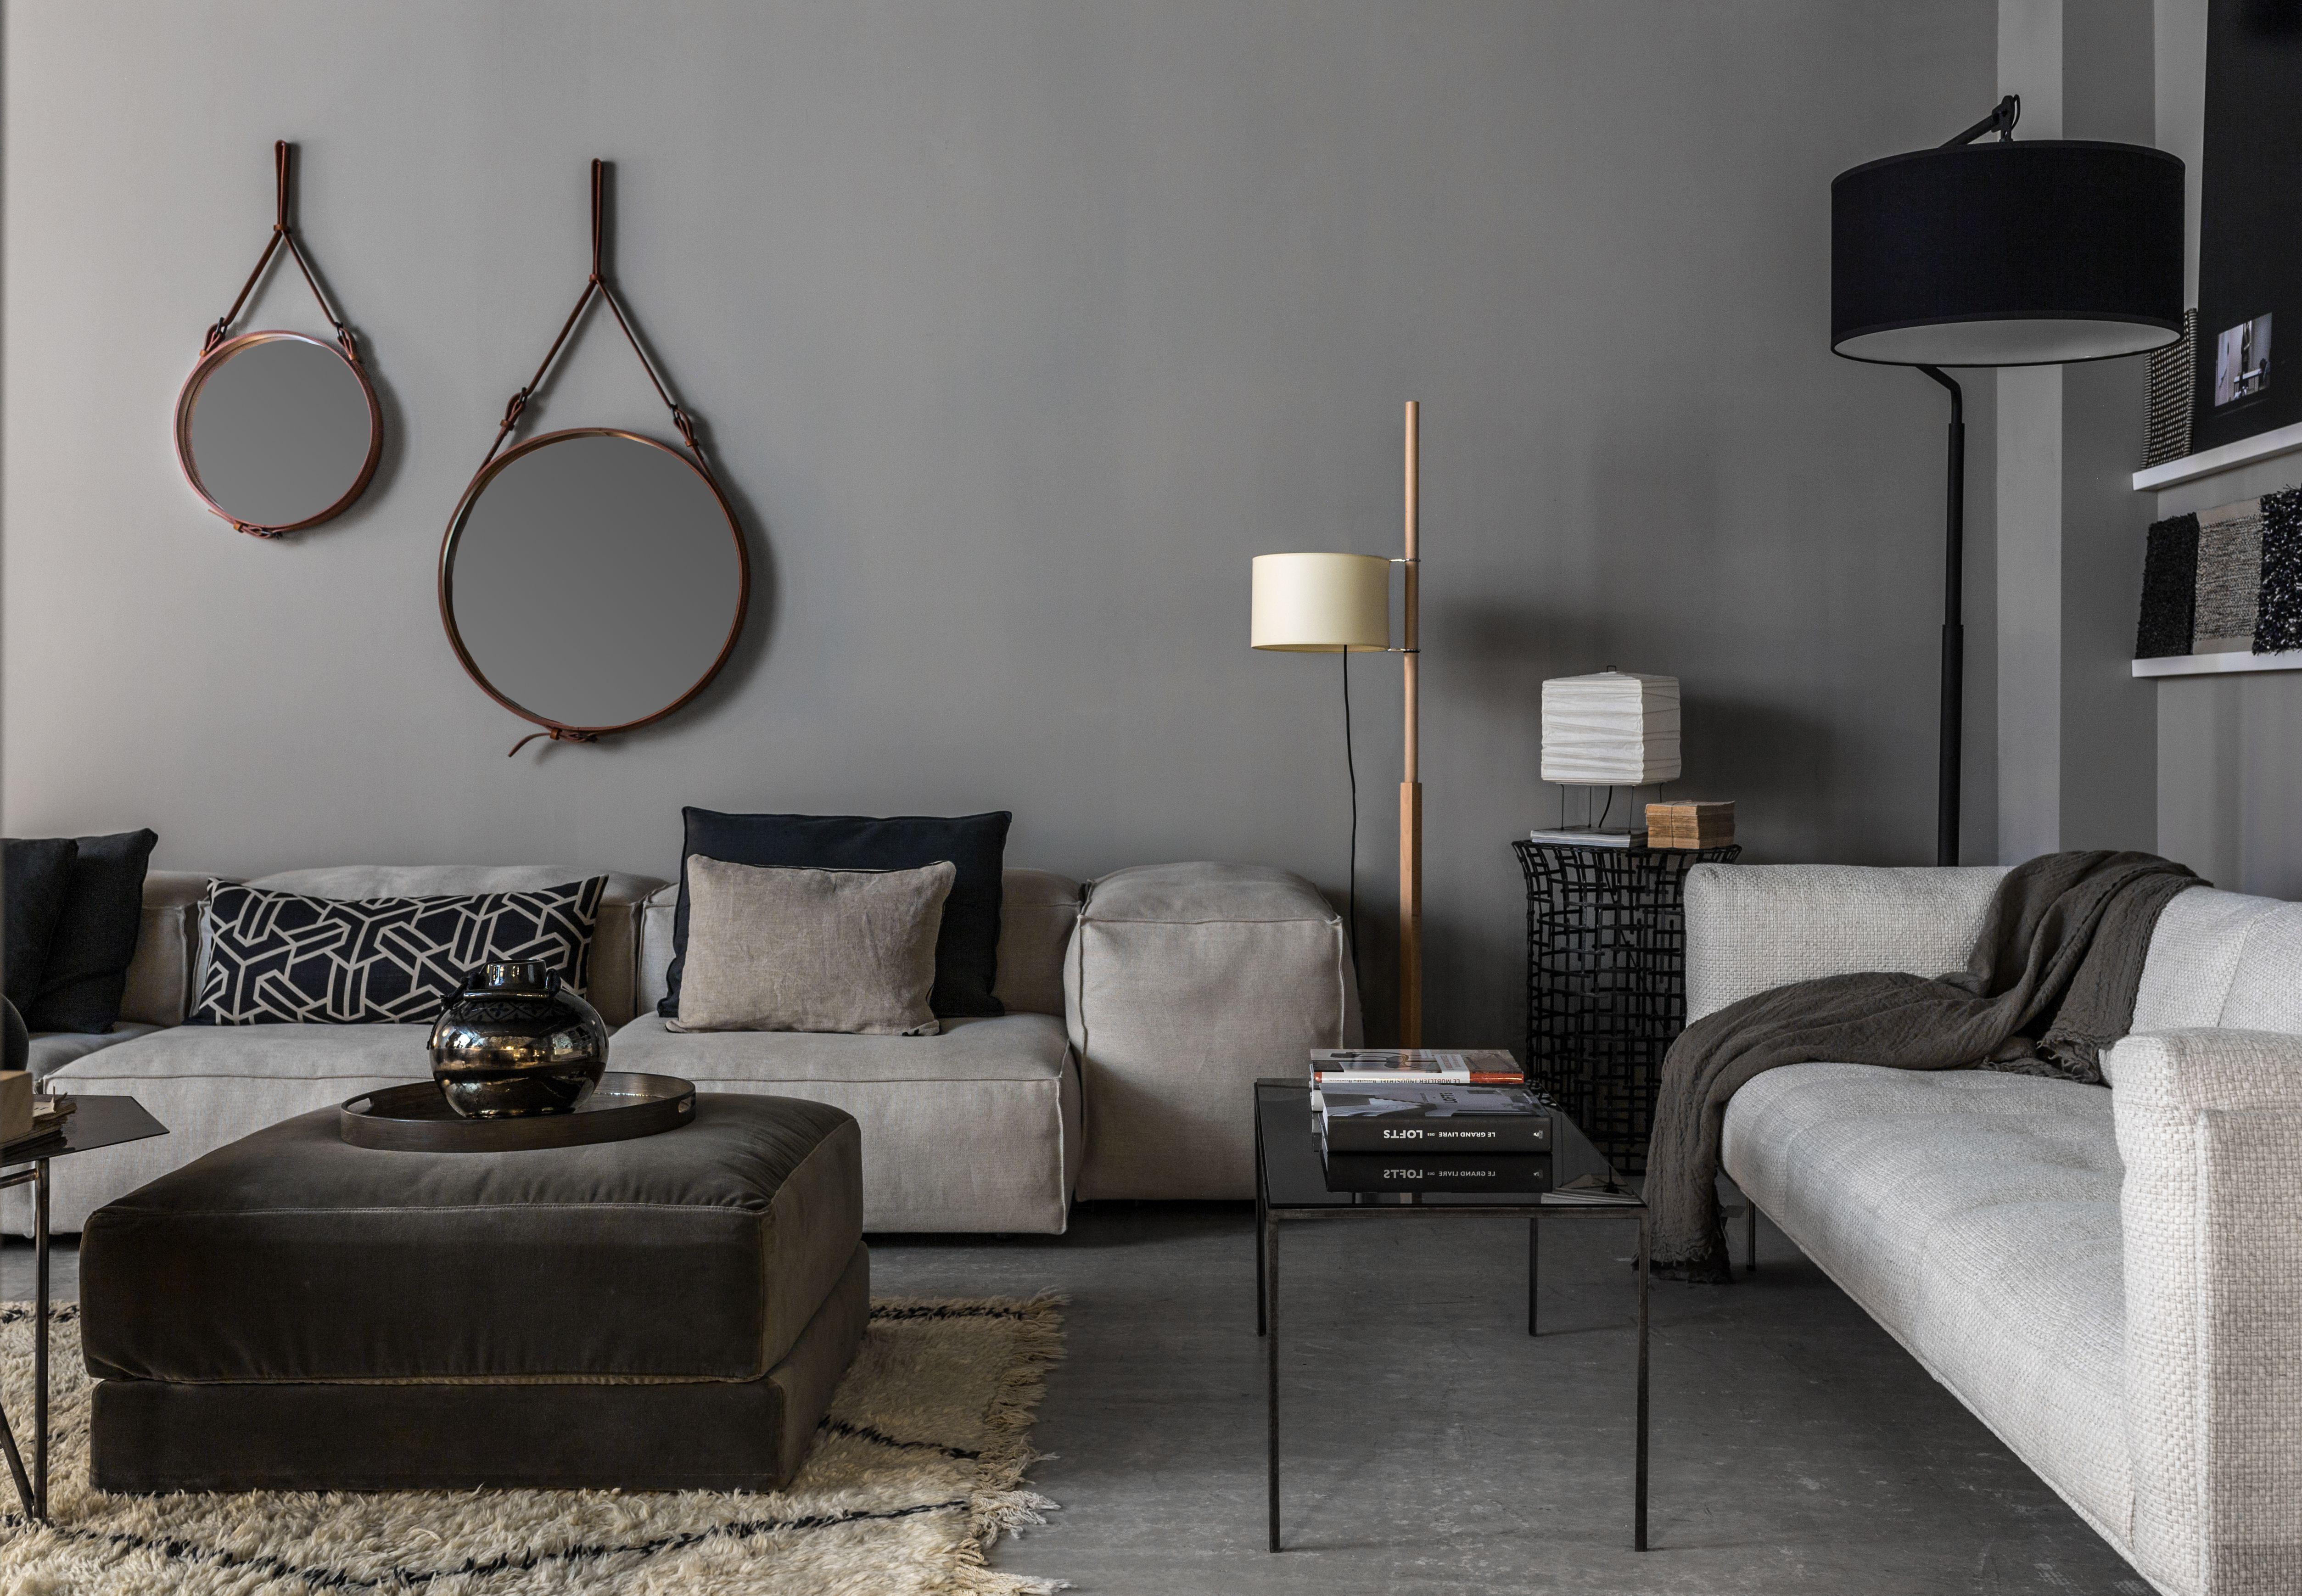 miroirs gubi canap extrasoft living divani lampe. Black Bedroom Furniture Sets. Home Design Ideas